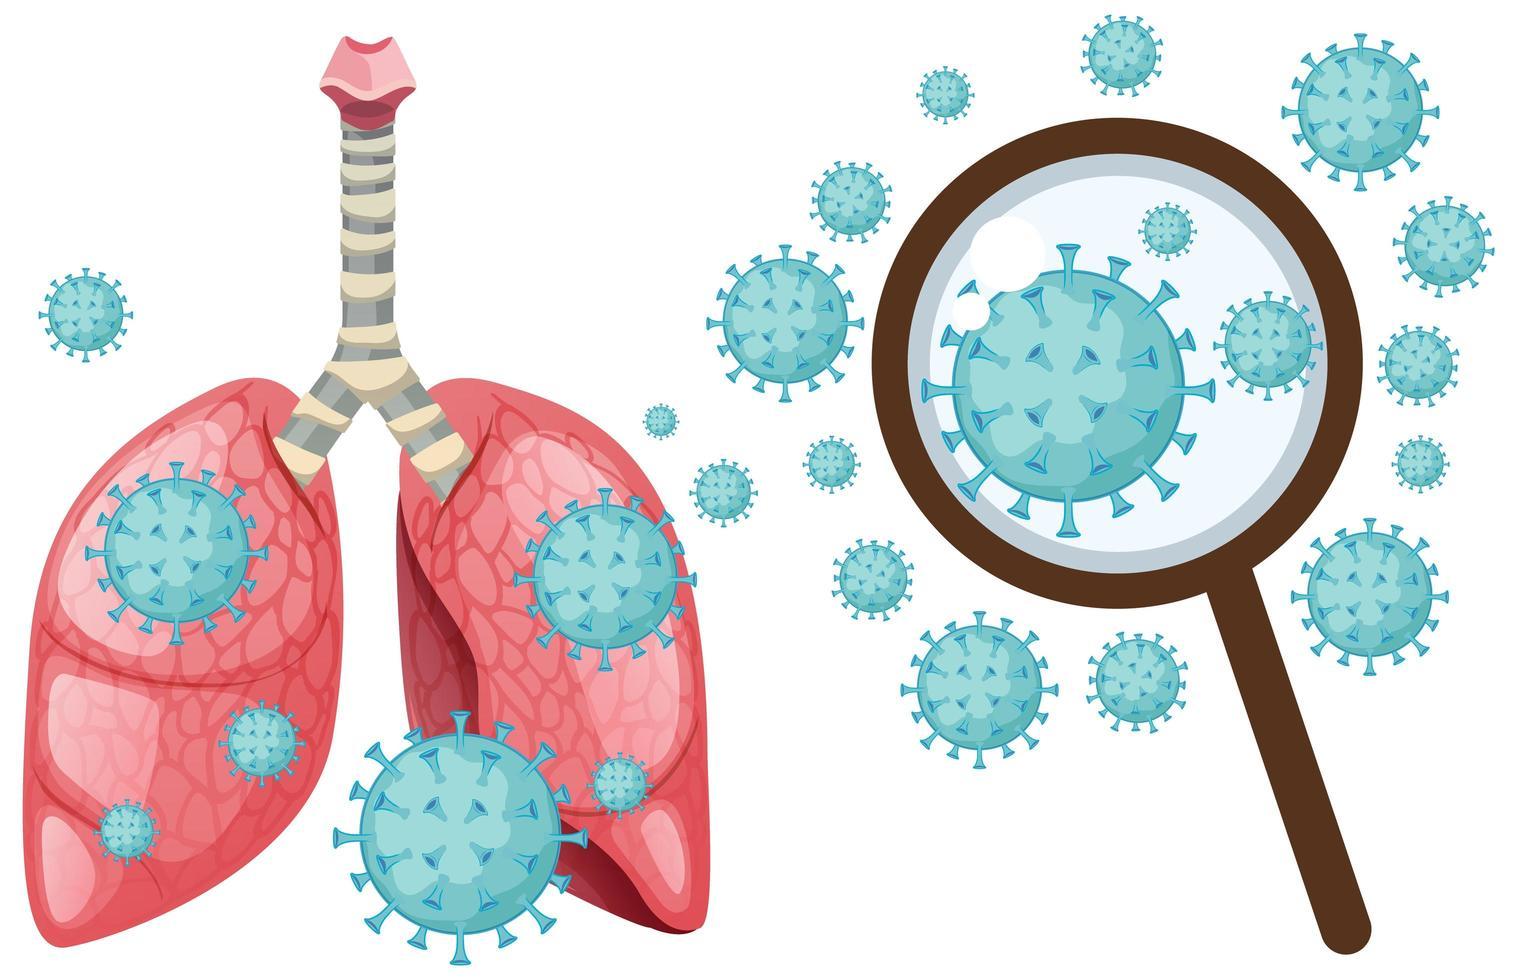 célula de coronavirus en pulmones humanos vector